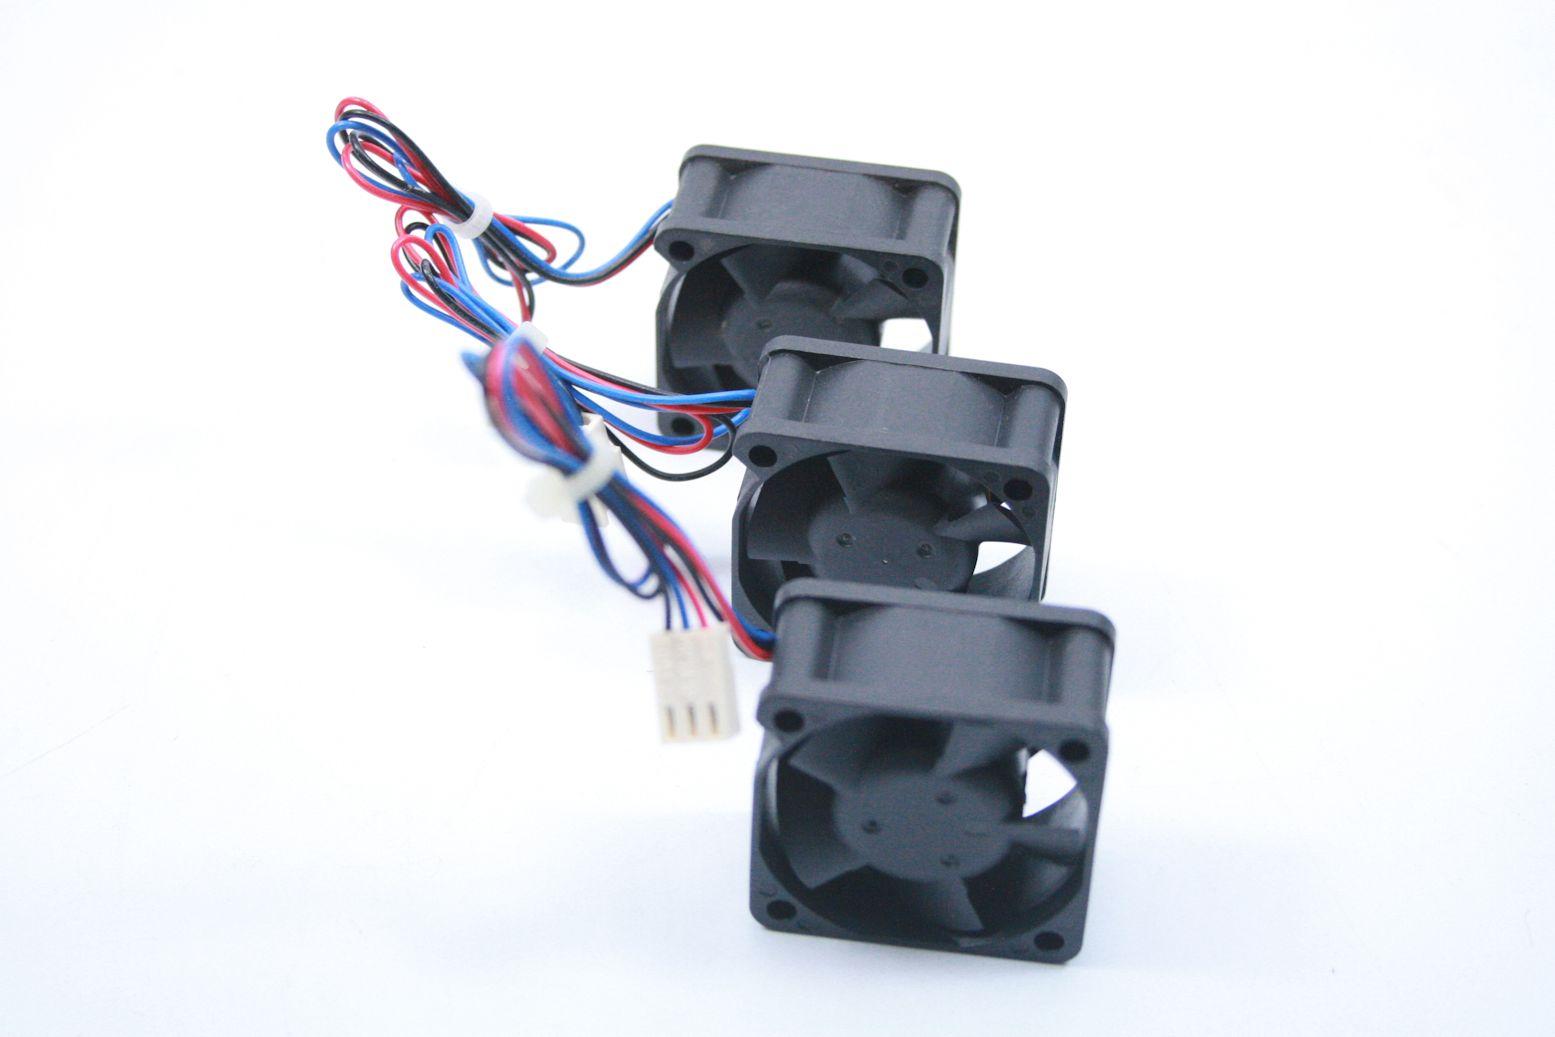 DELL PowerConnect 6224 2748 5448 Lüfter 3x Fan Kit Set H969F